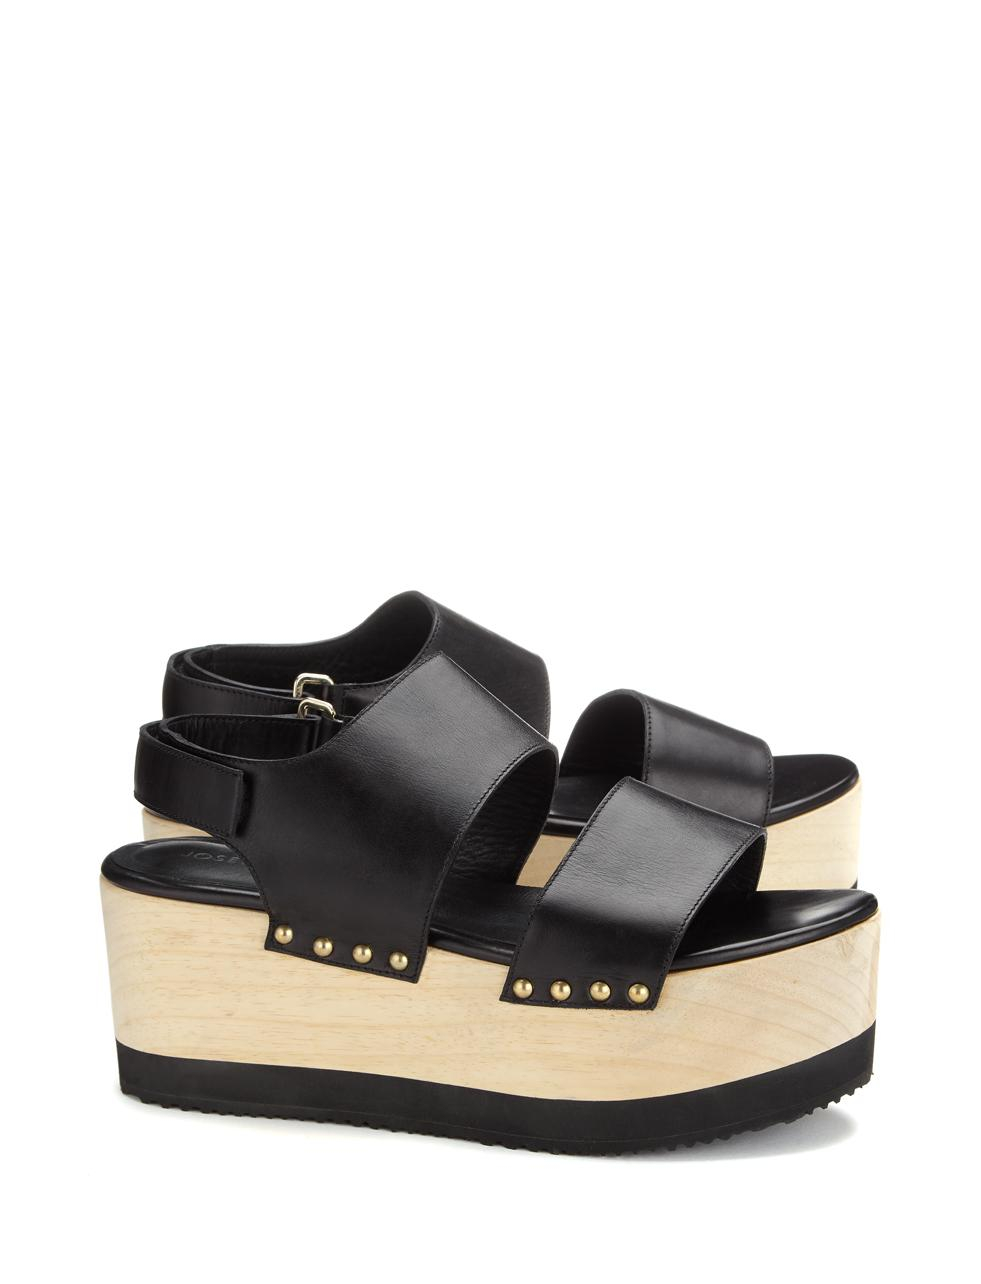 joseph platform sandal shoe in black lyst